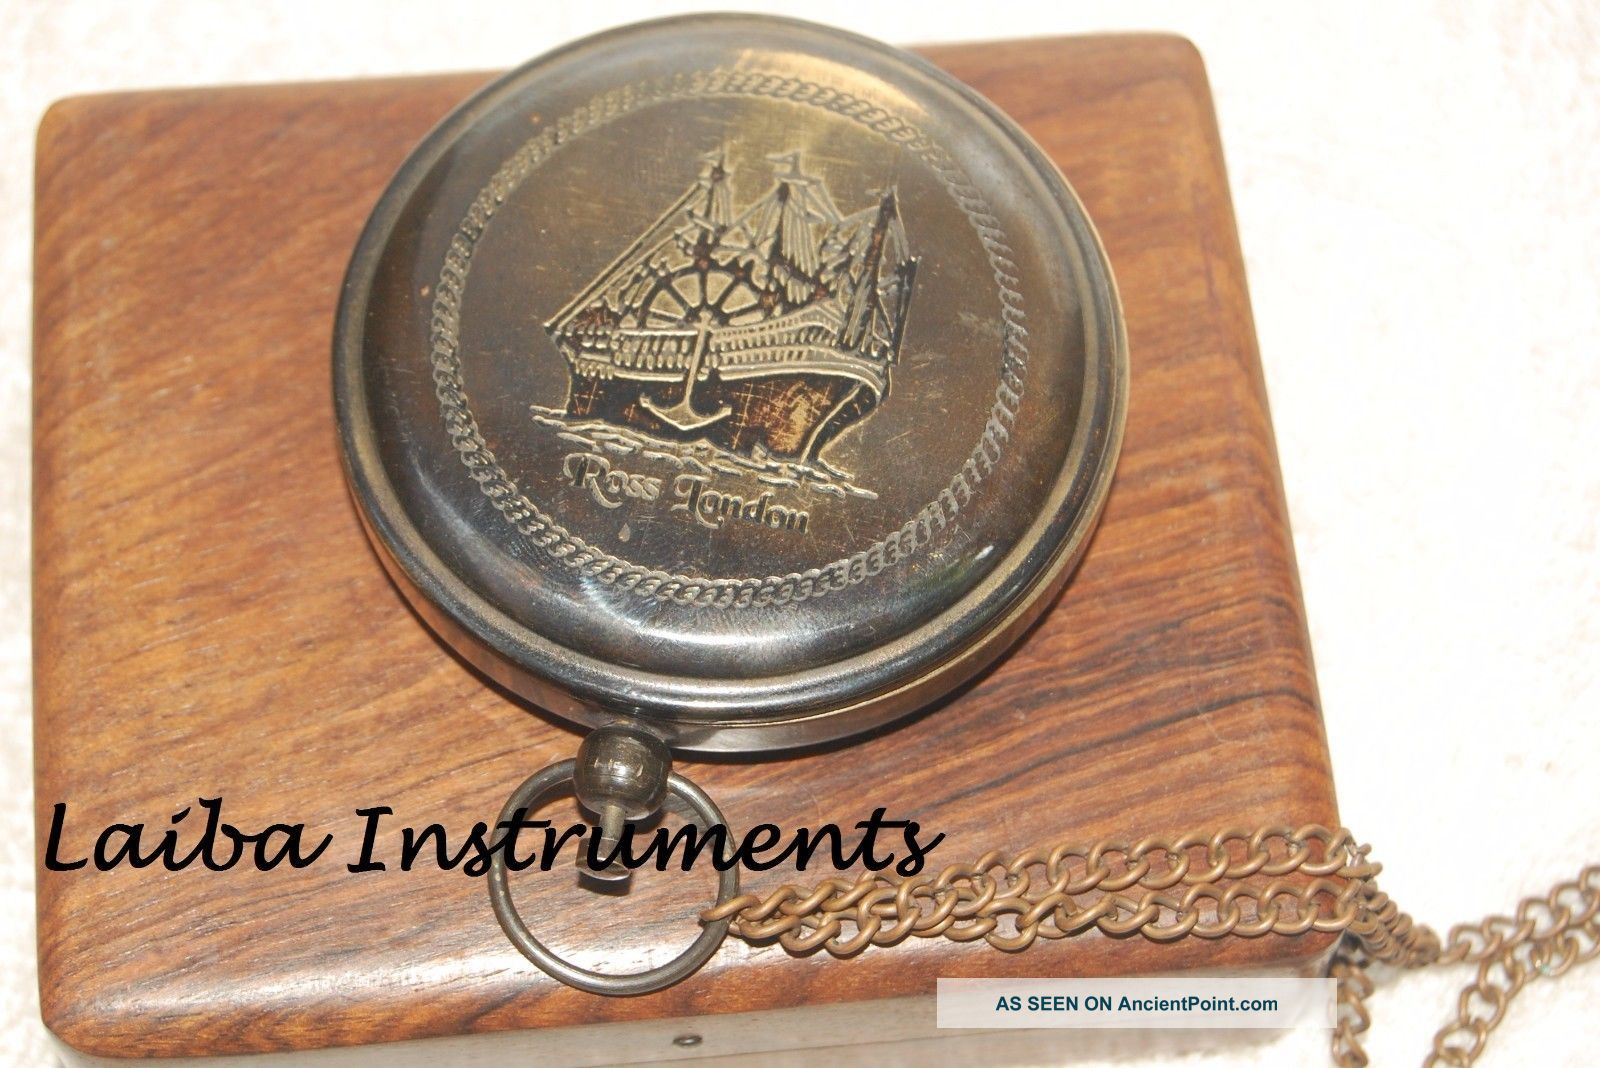 Antique Ross London Push Button Compass Sundial Compass Poem Compass Brass Gift Compasses photo